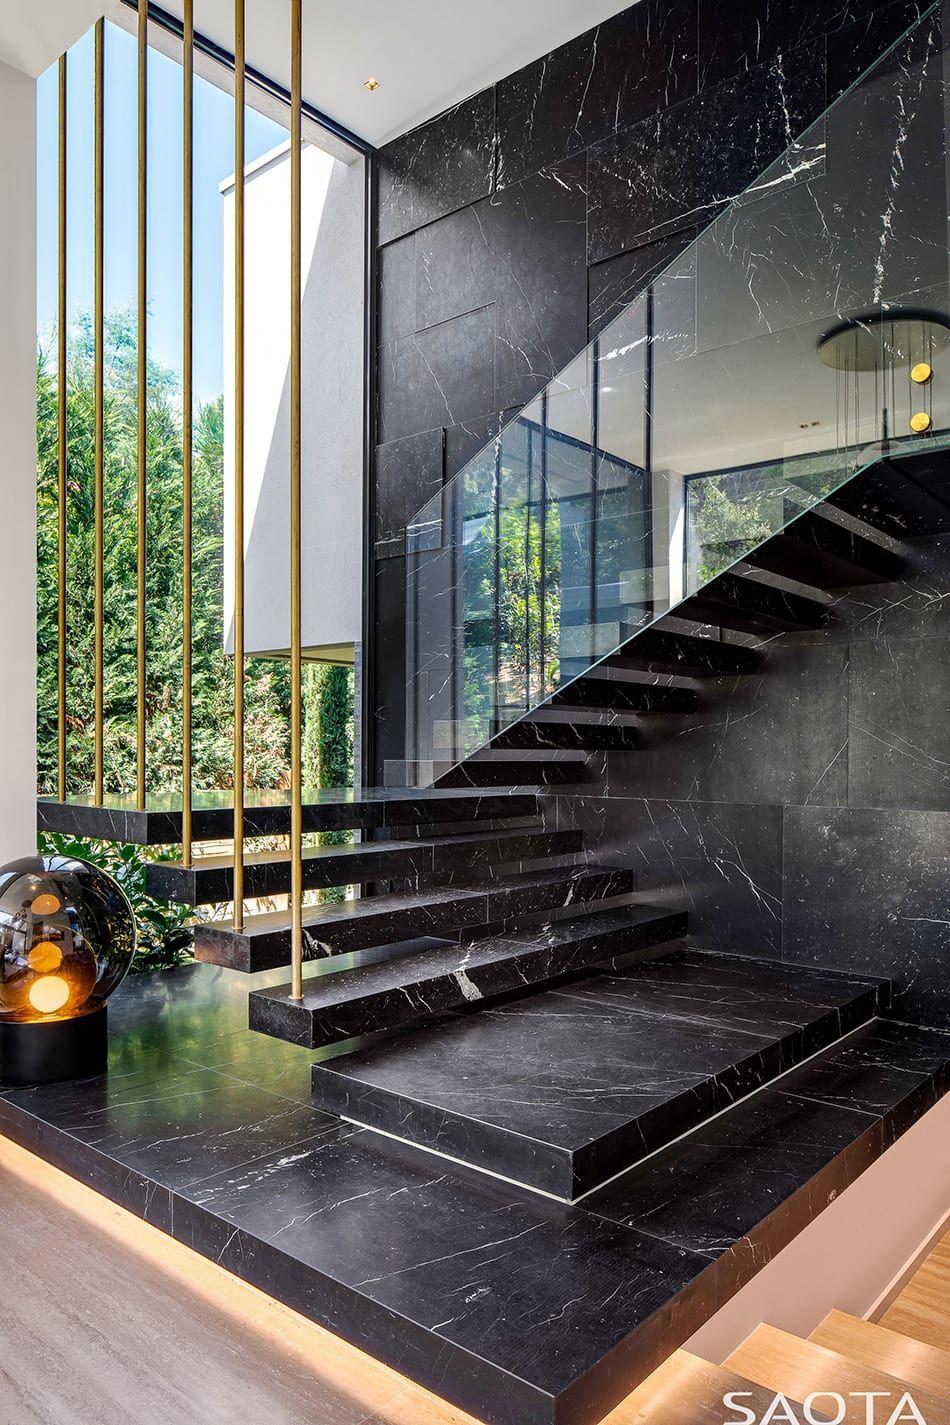 Saota Le Pine Summer House Escalier En Marbre Escalier